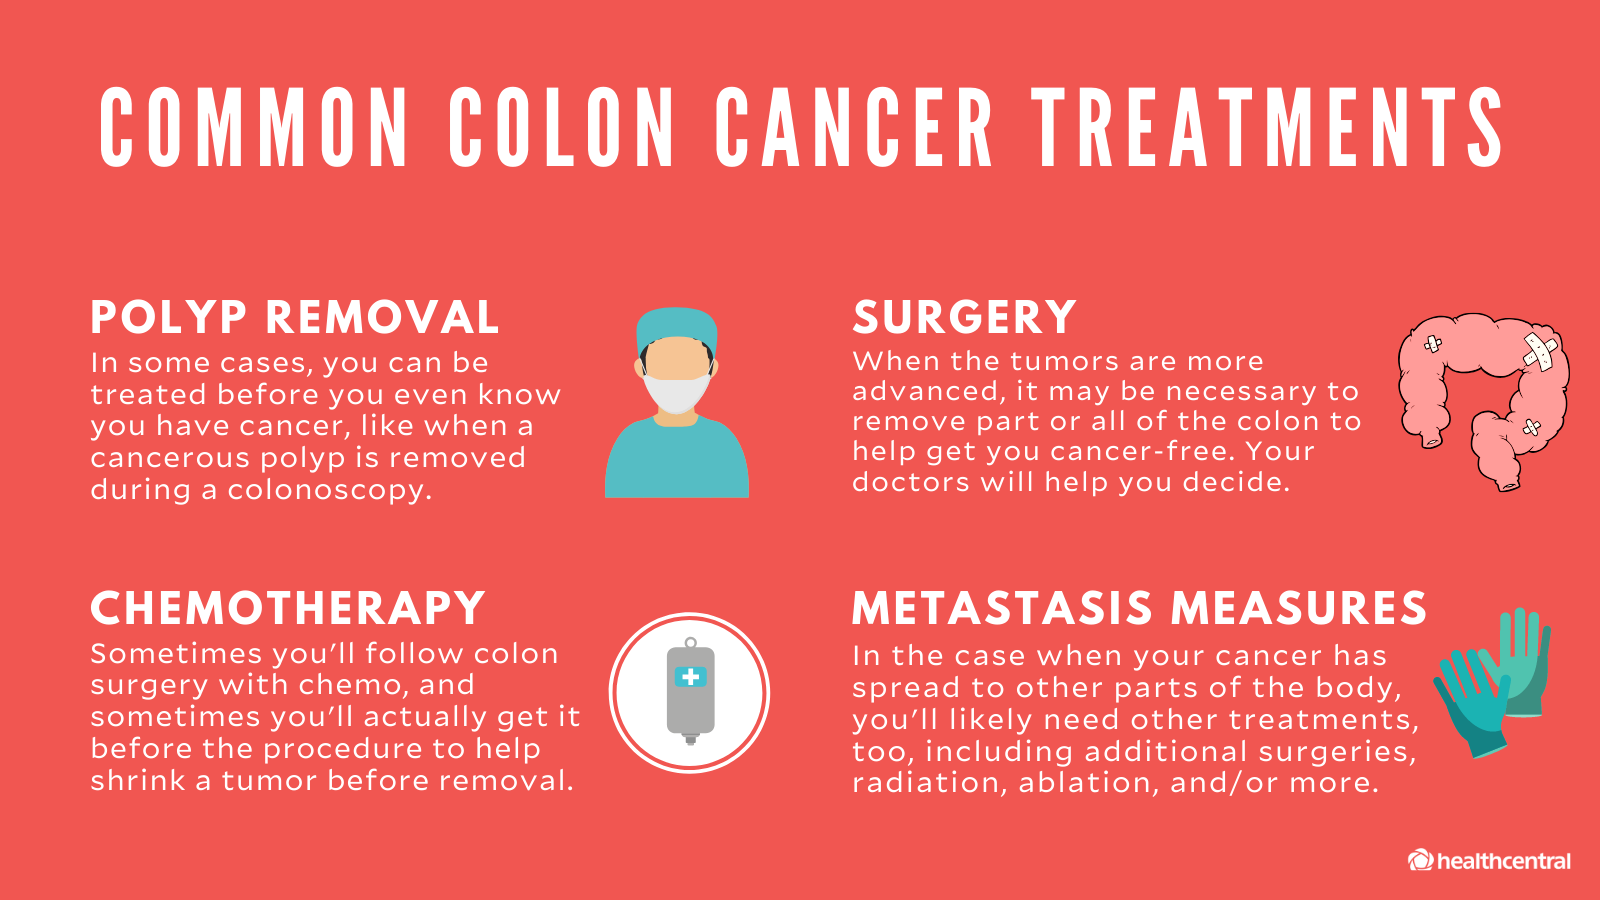 cancer colon has human papillomavirus or hpv family